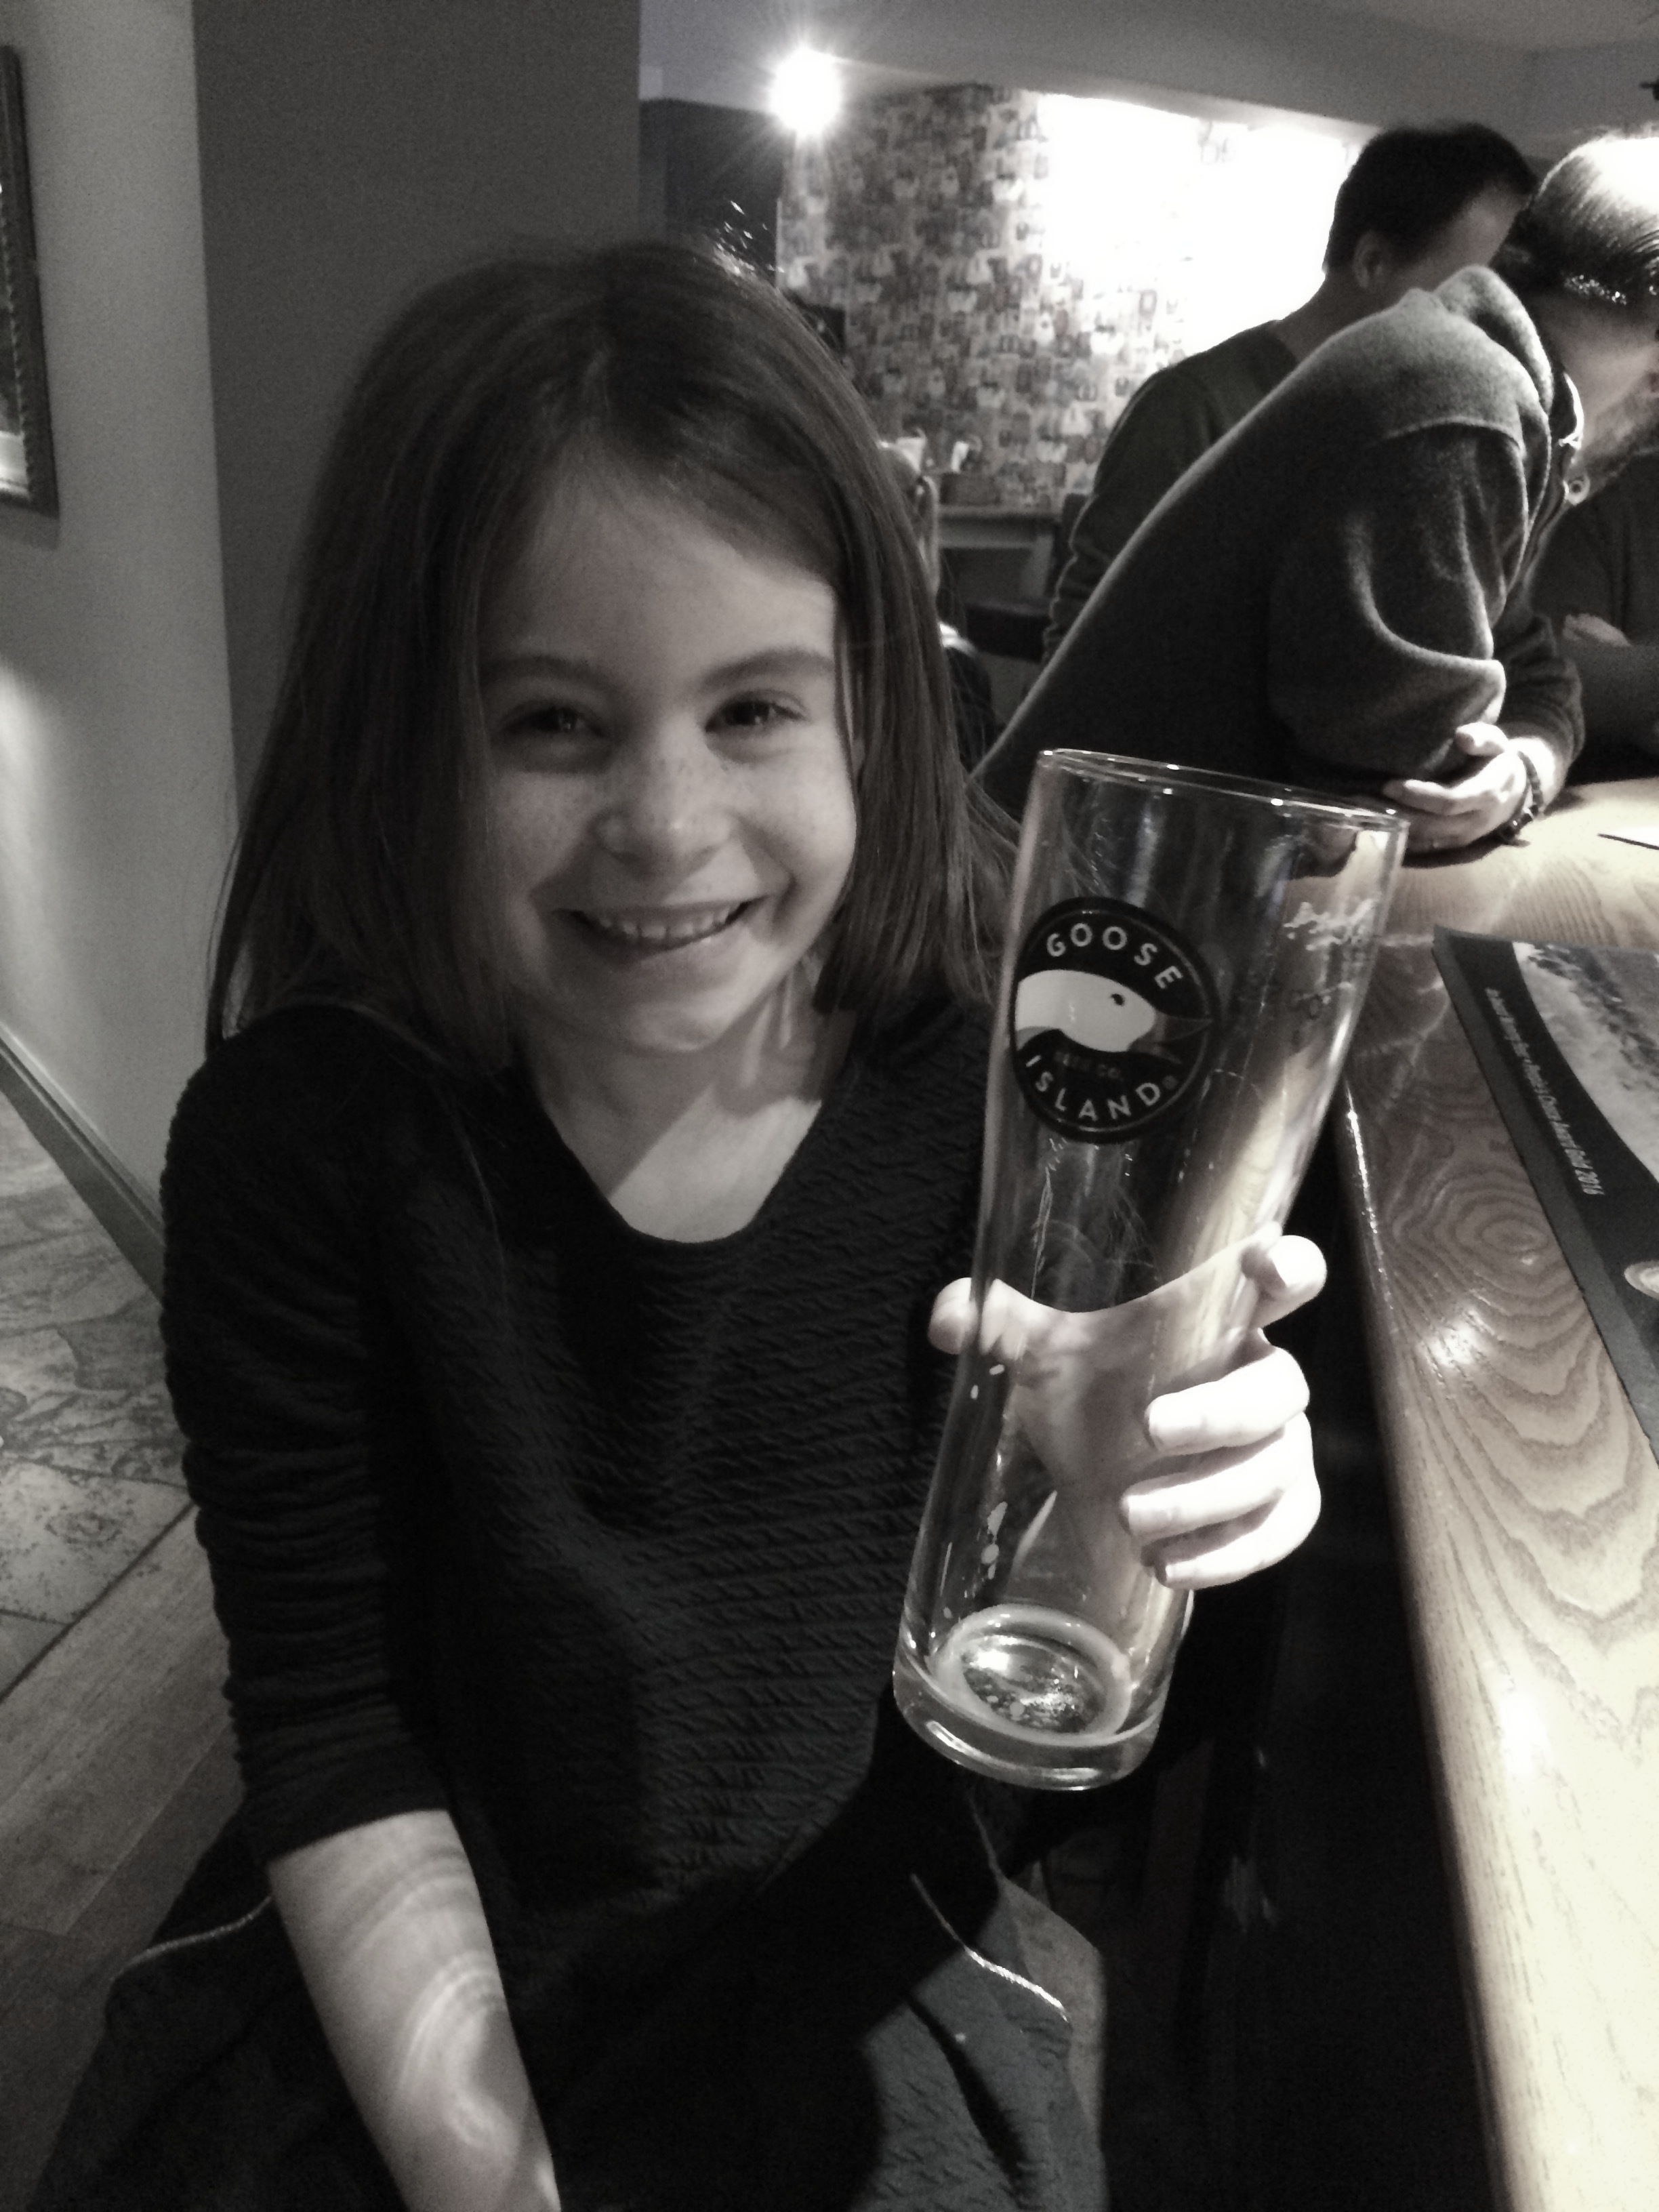 Pickle - Hospitality, Big Sis to Boo